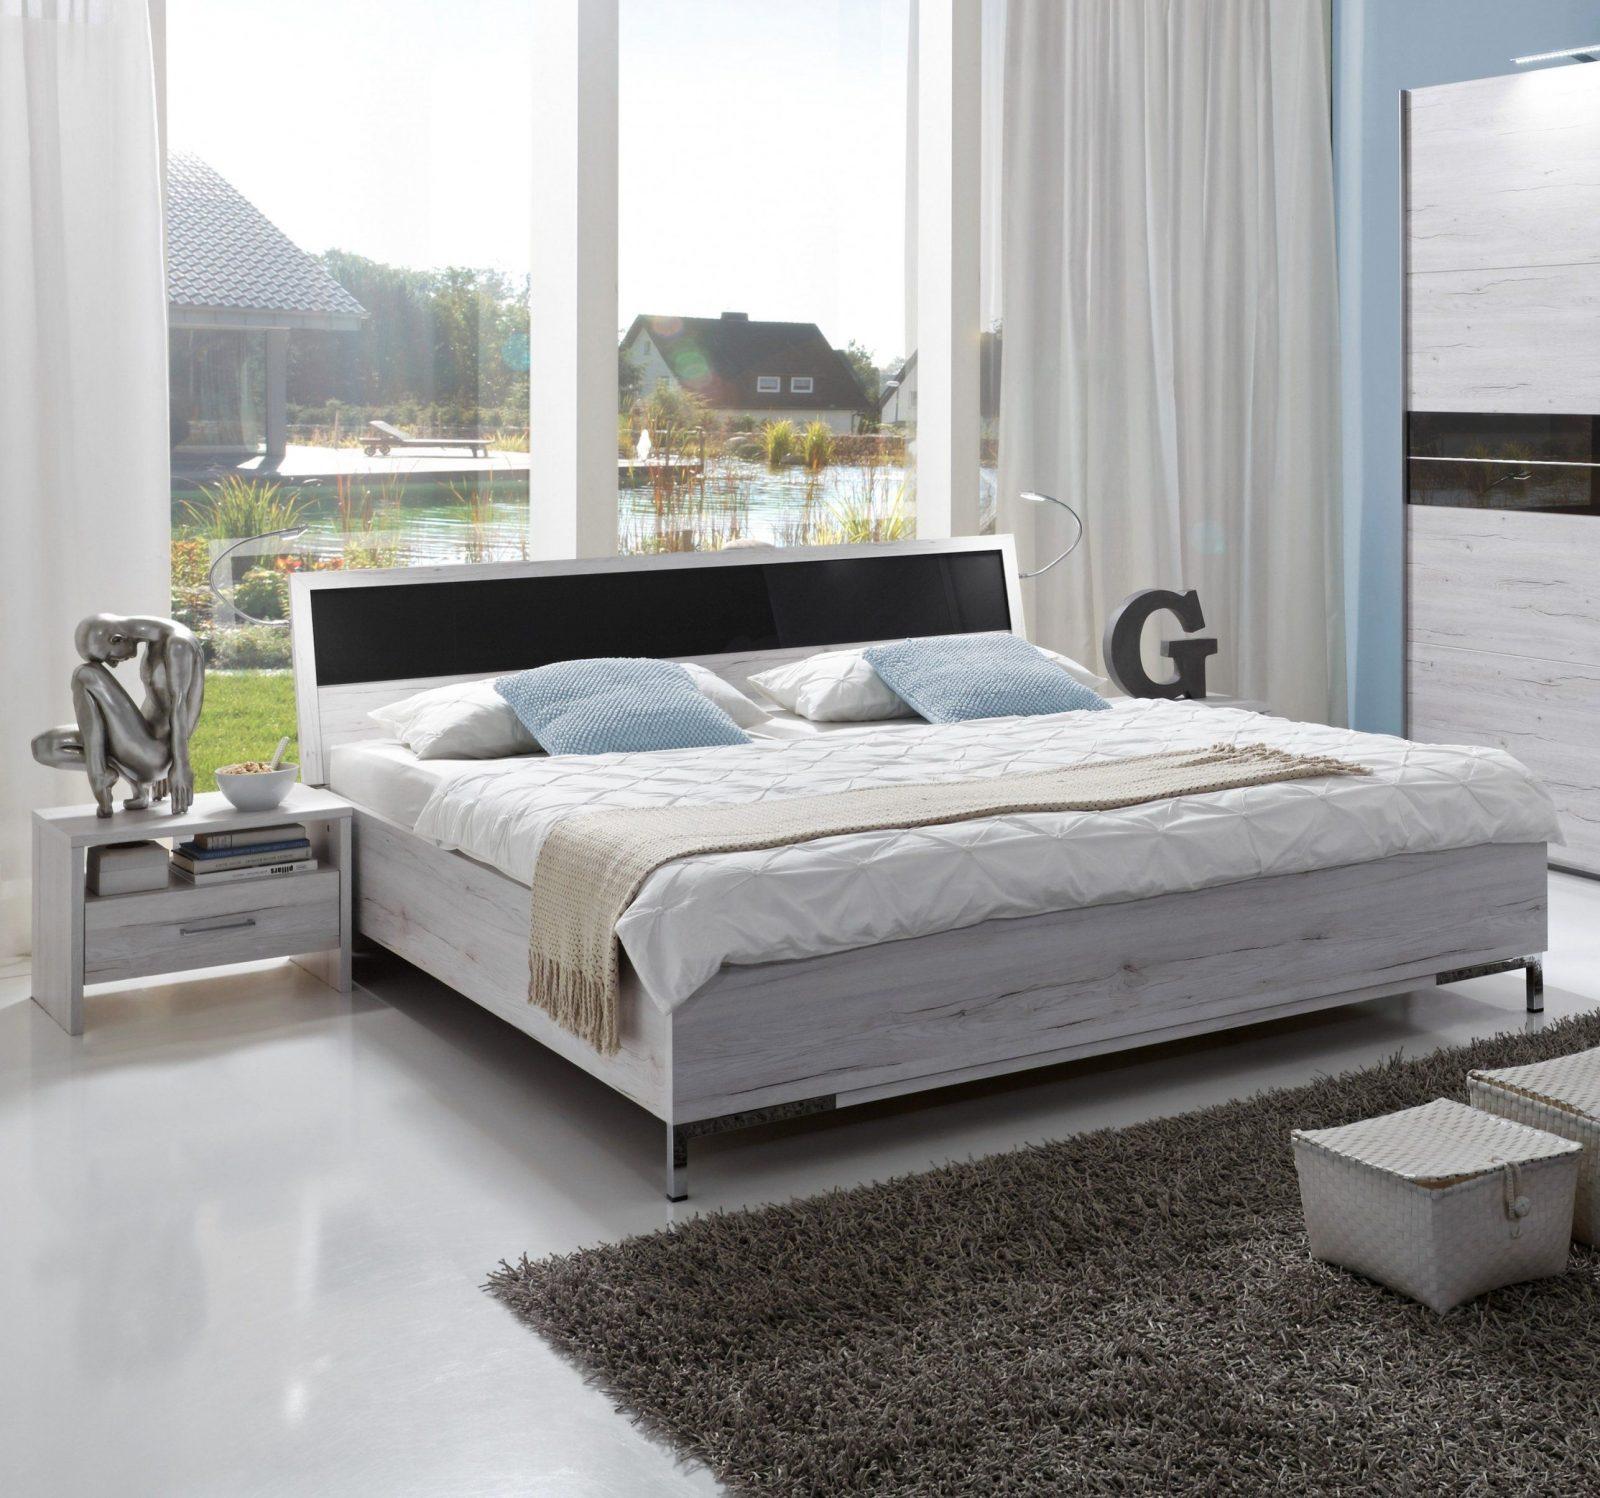 bett kopfteil selber bauen great good excellent bett kopfteil selber machen anleitung bett. Black Bedroom Furniture Sets. Home Design Ideas